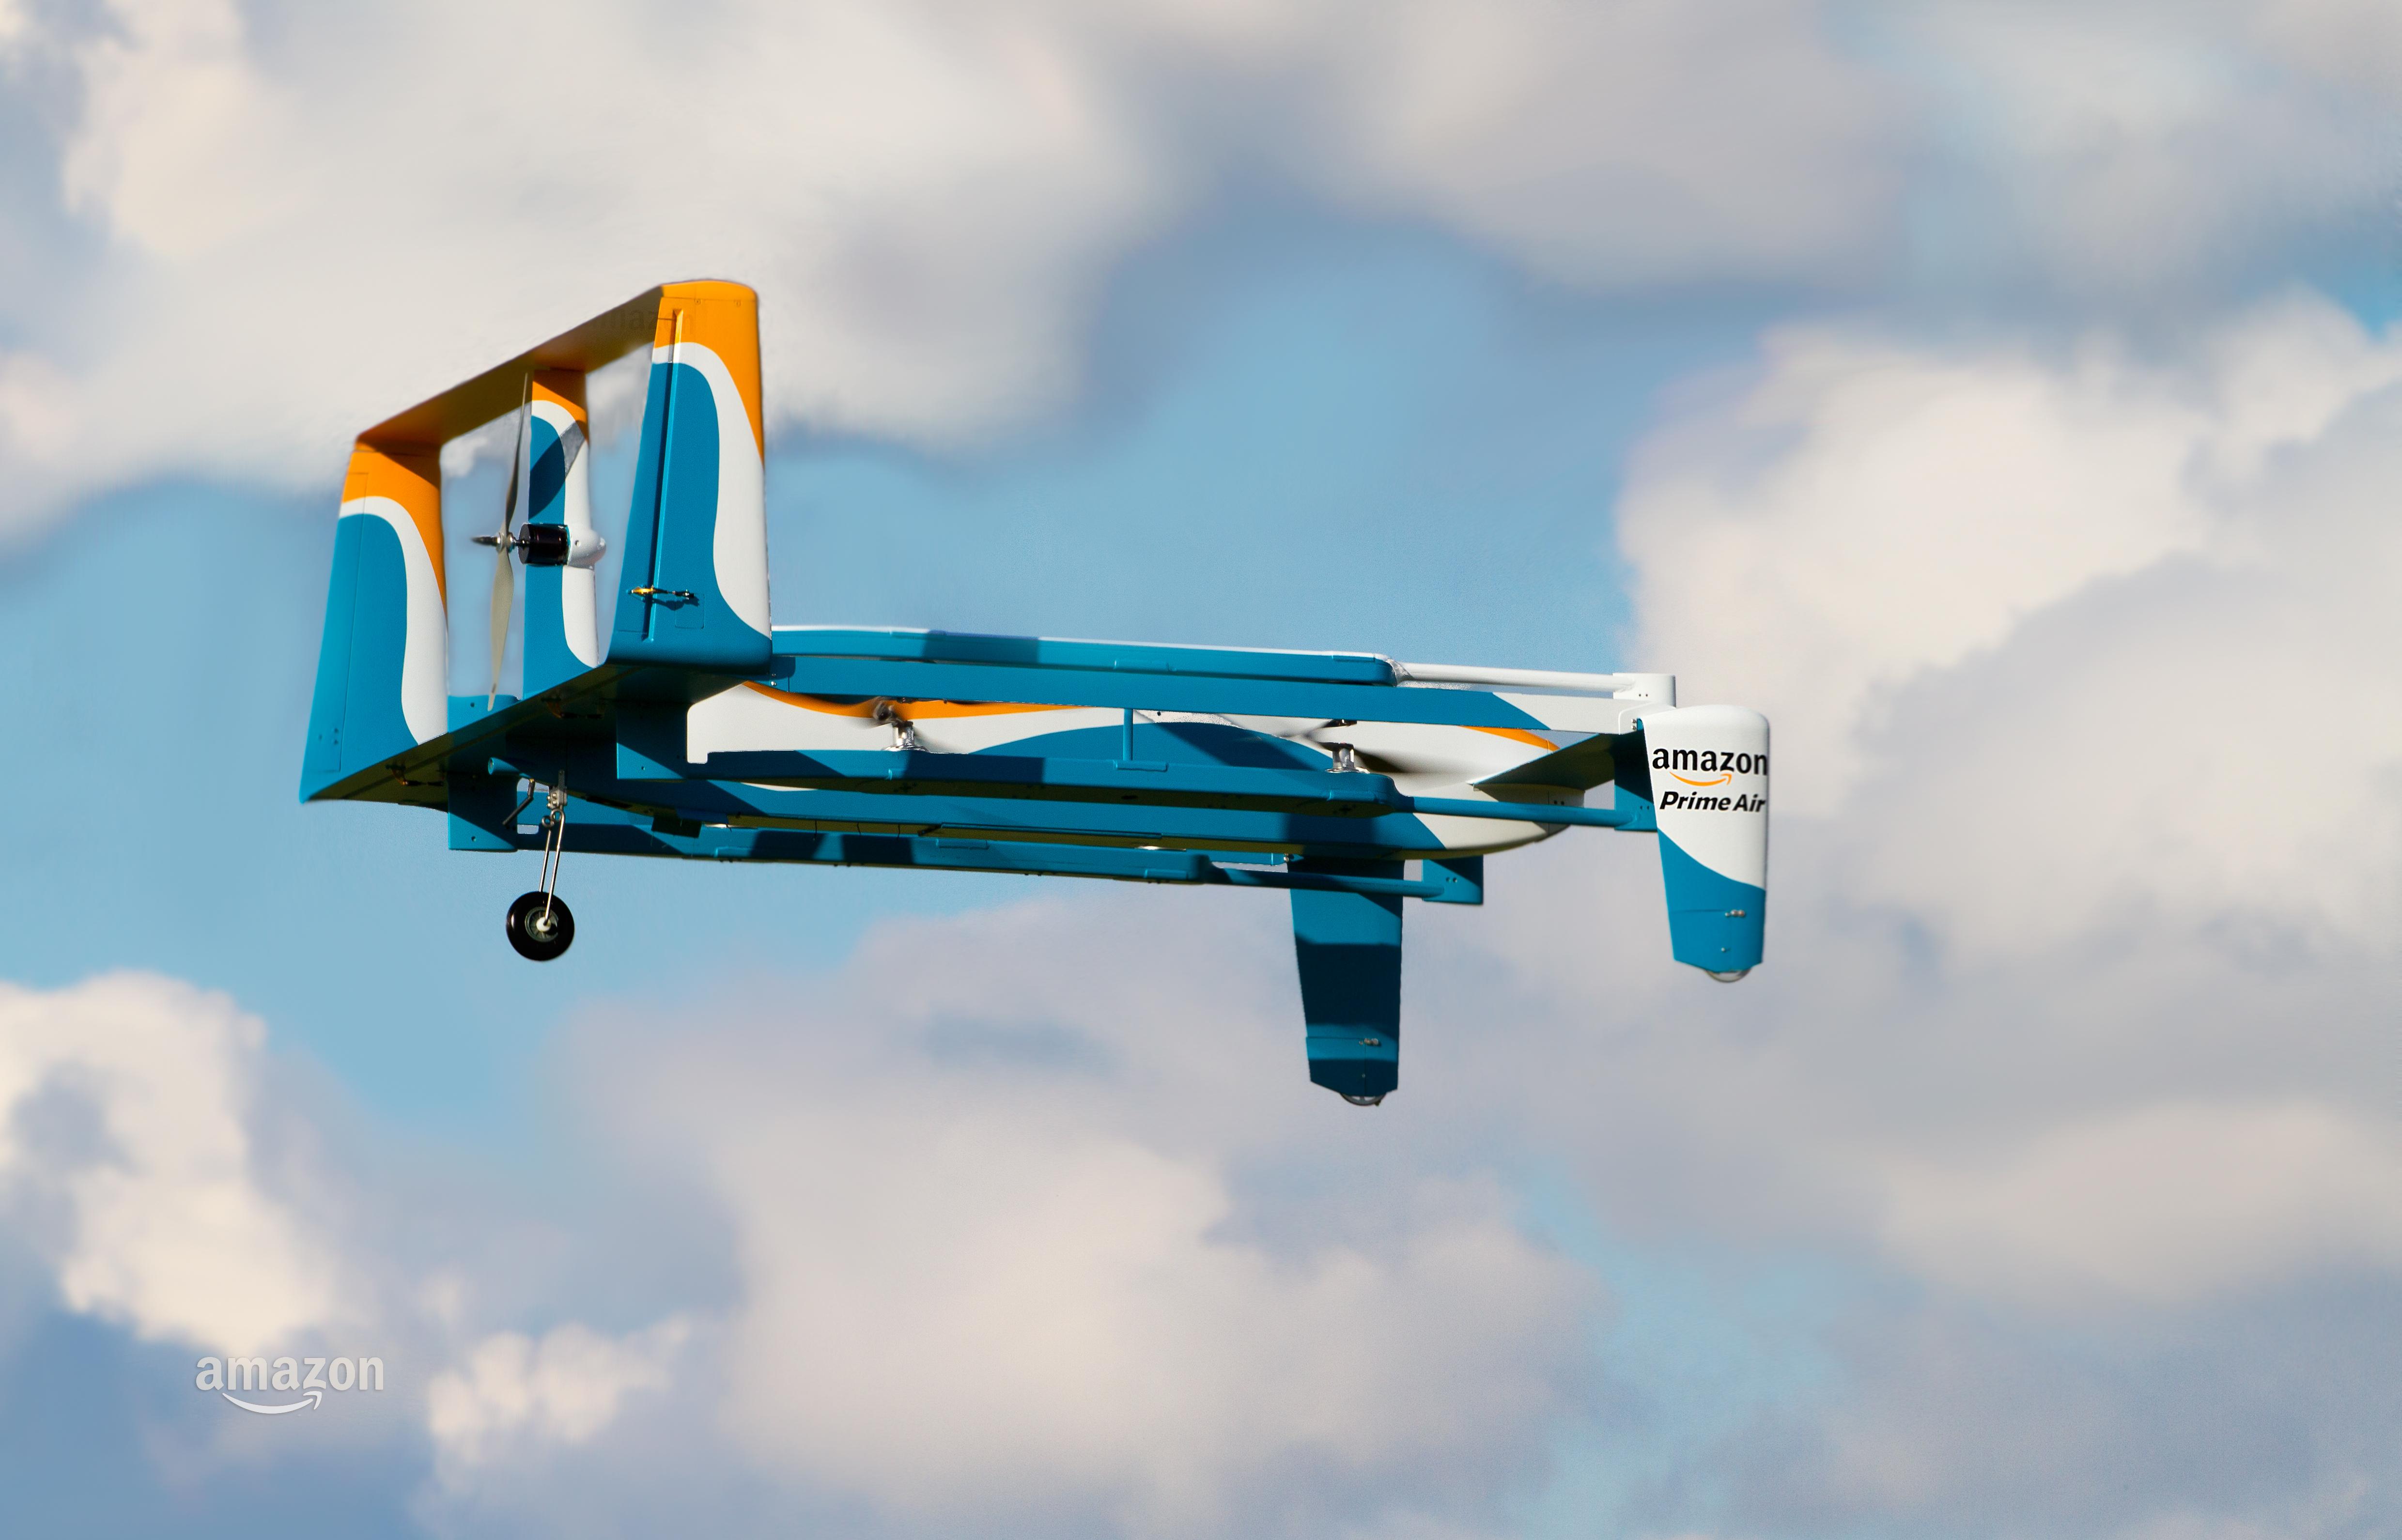 Amazon Prime Air delivery drone.